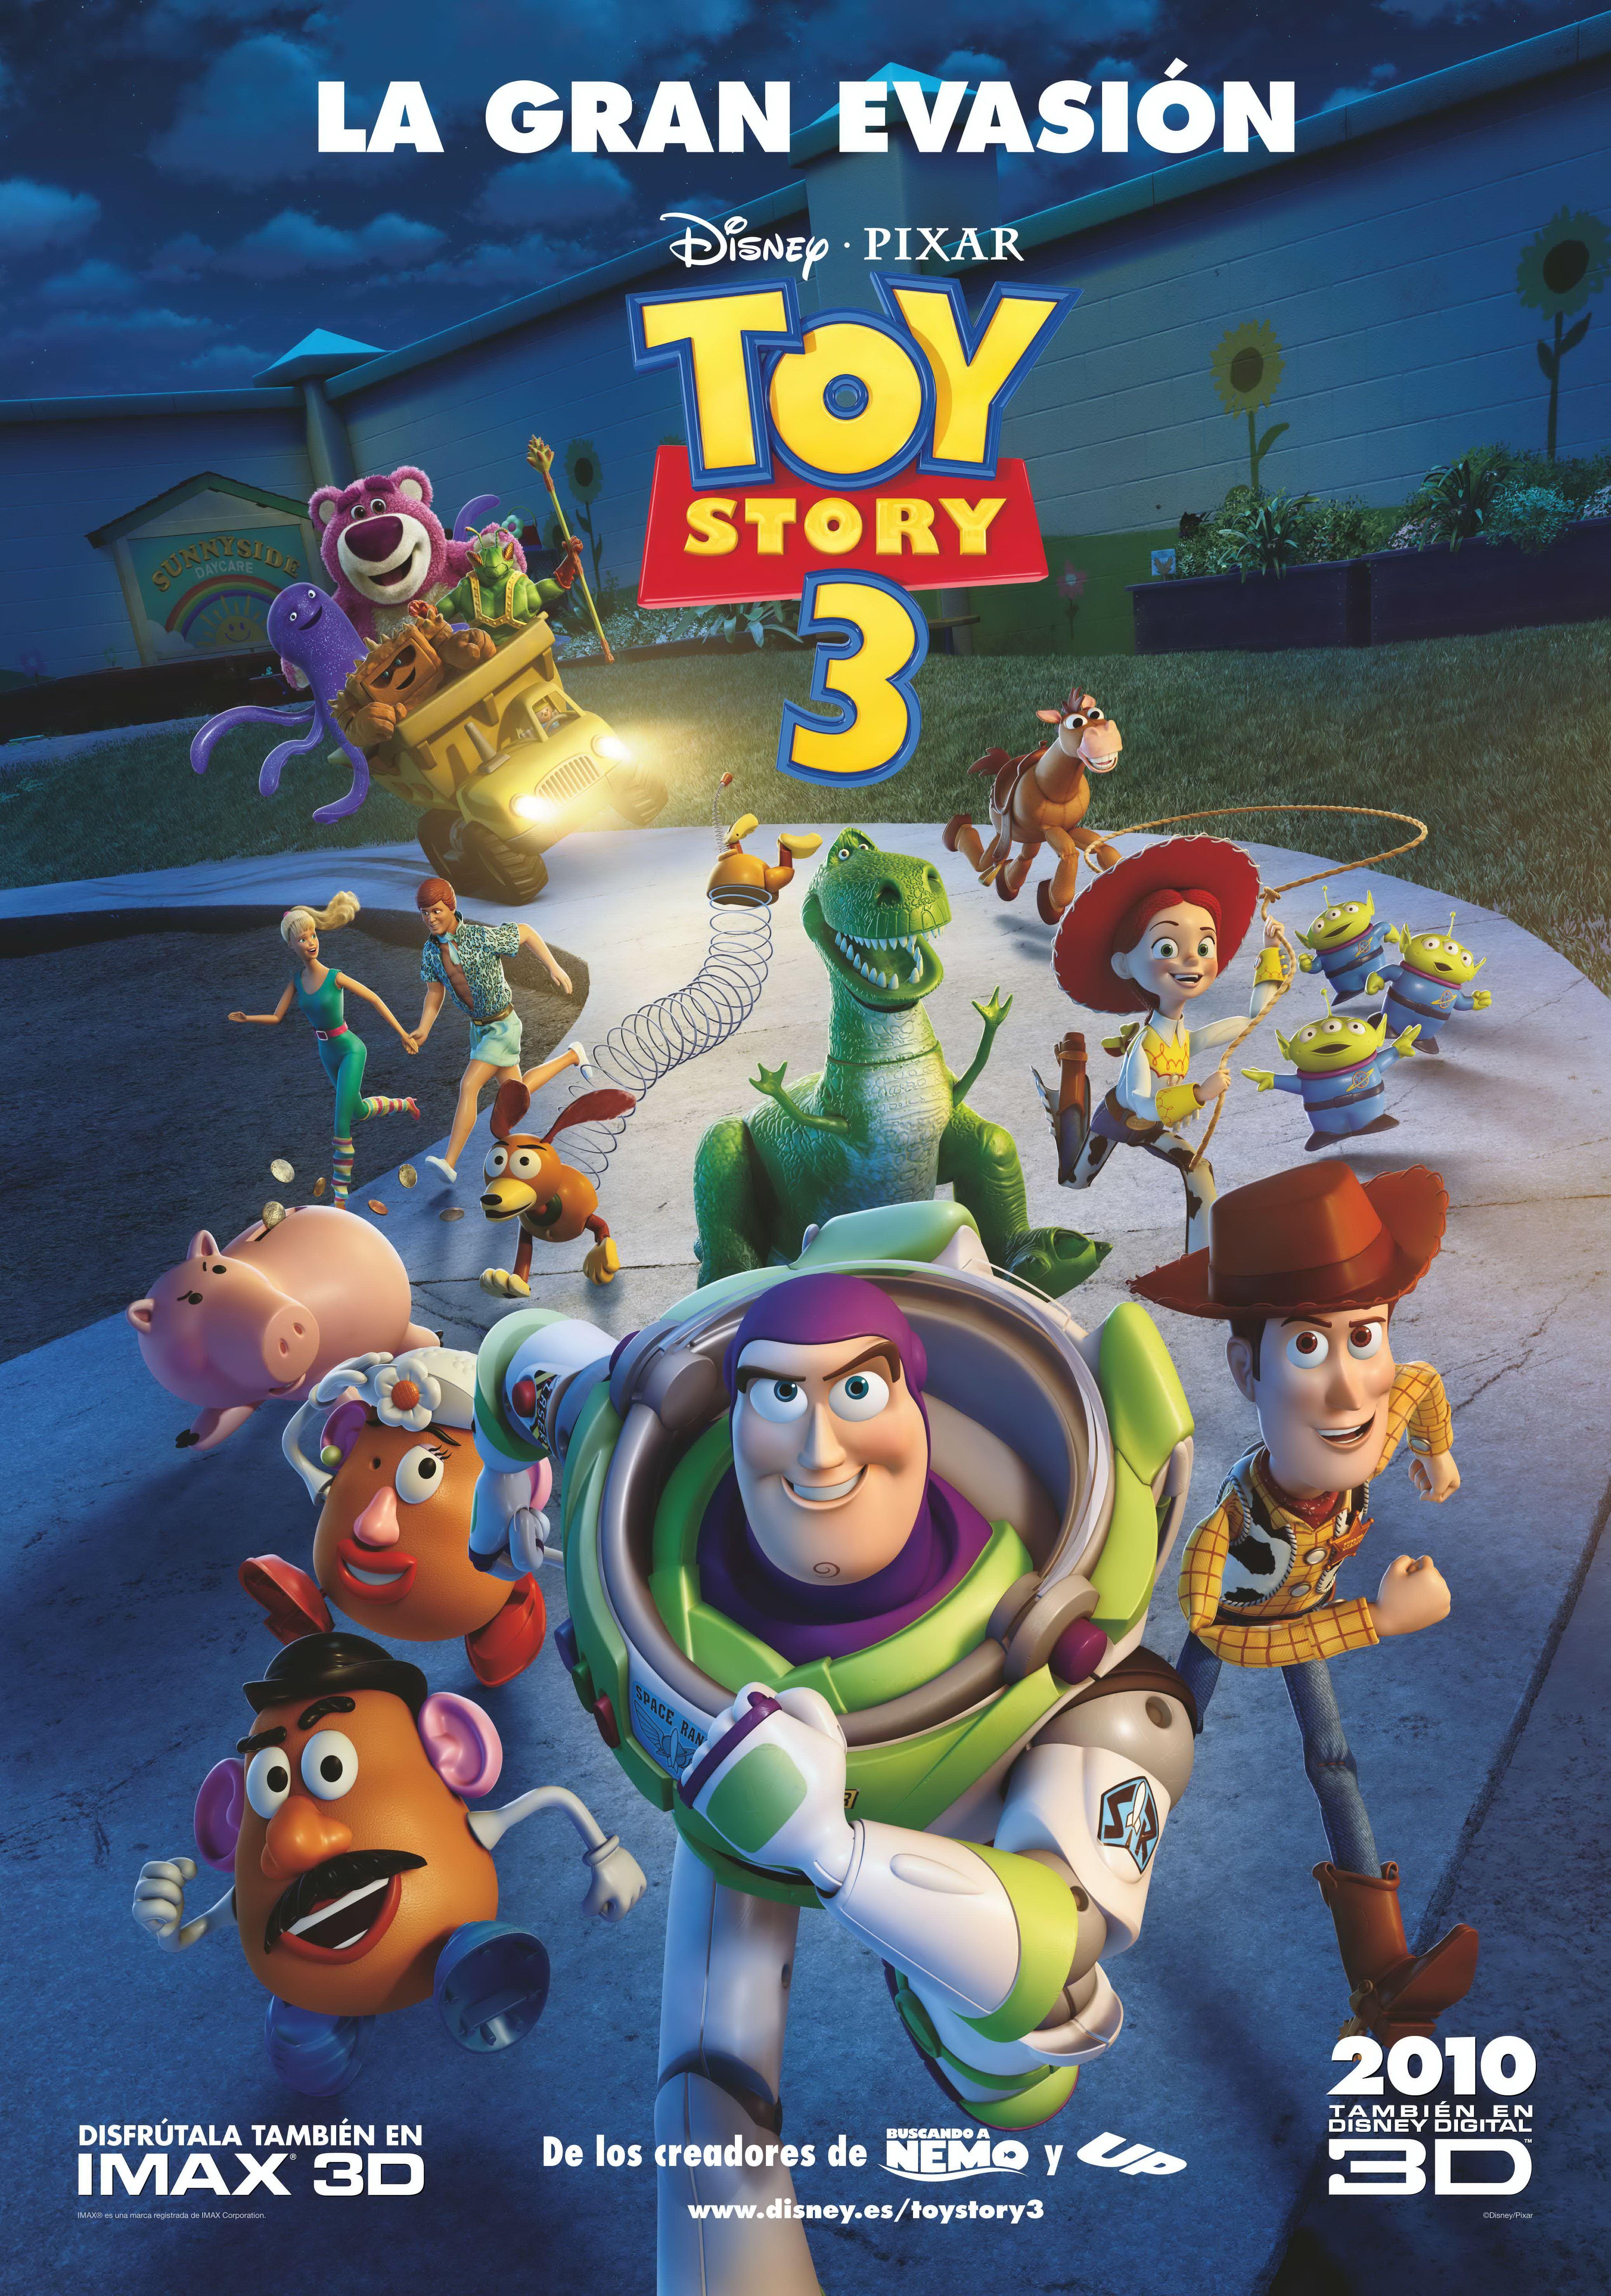 2010 - Toy story 3 - tt0435761 52fa53d5ac8